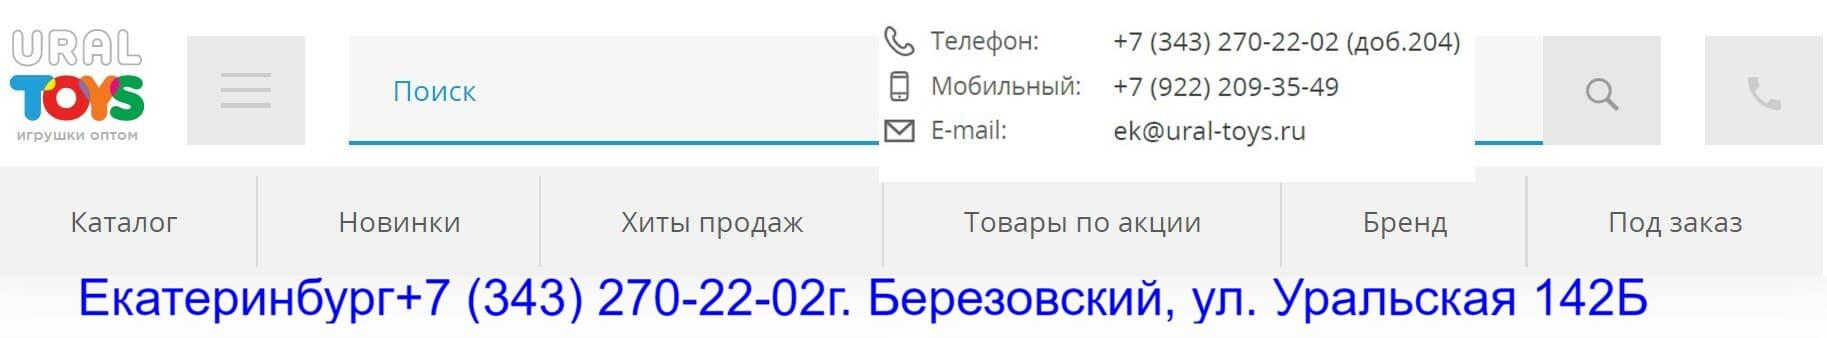 Урал Тойз сайт